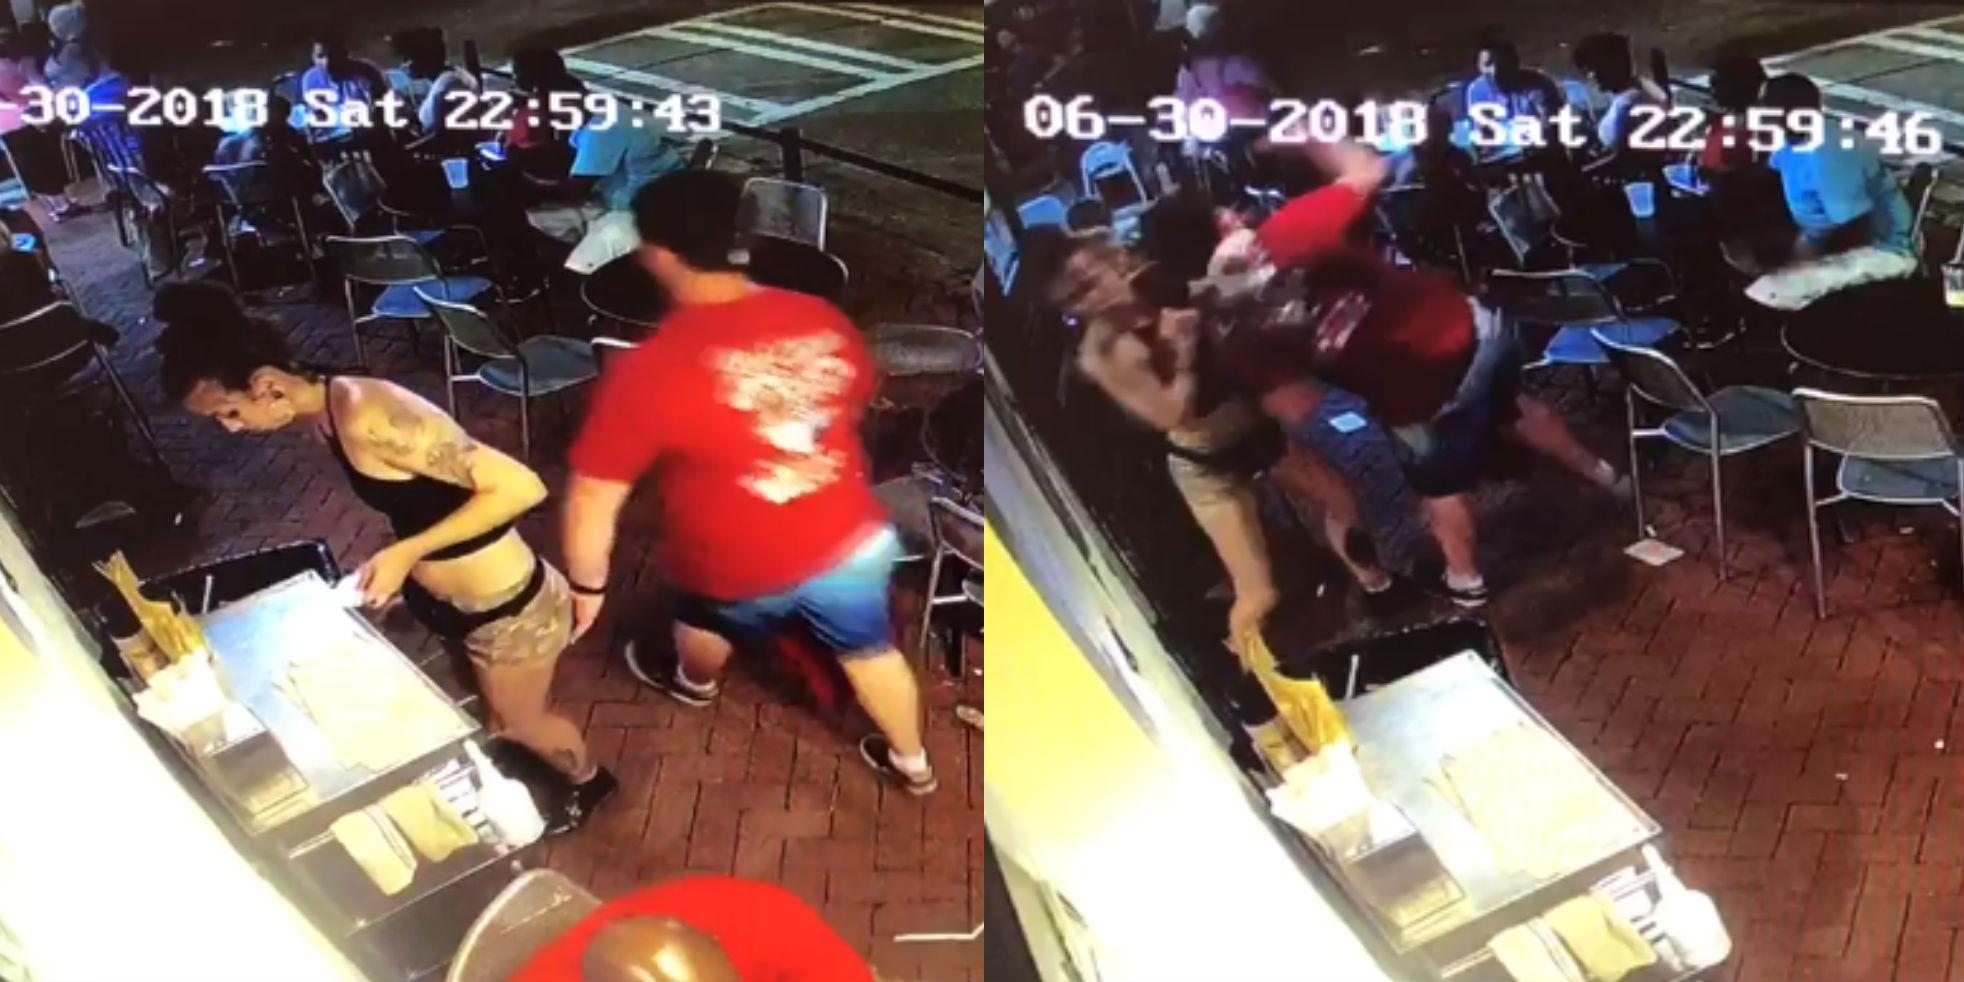 Ass Grope man gropes waitress in restaurant so she slams him into the